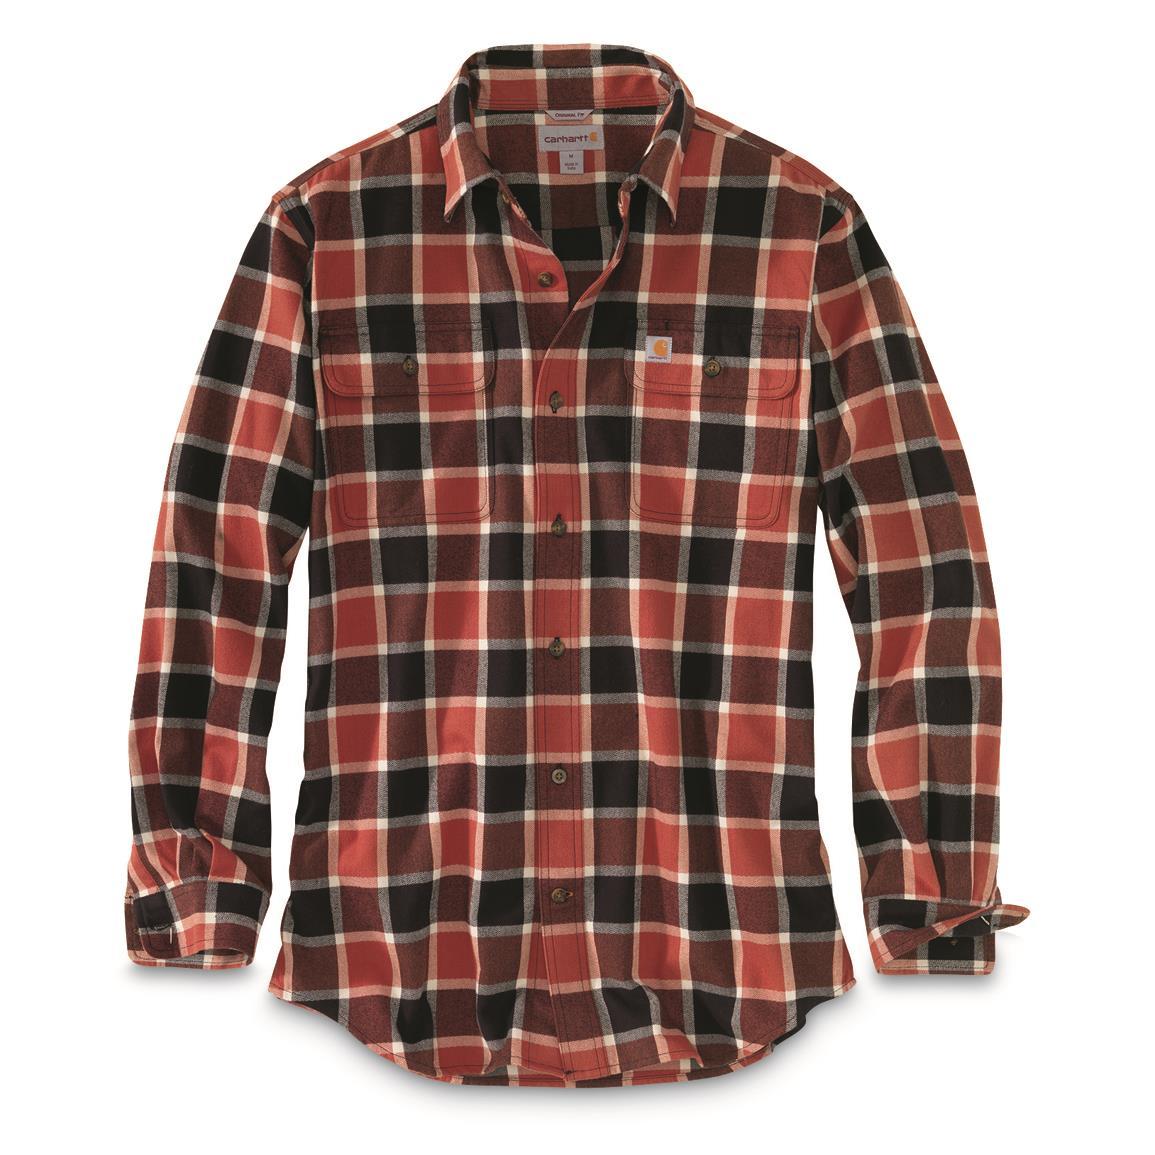 plaid shirts carhartt menu0027s hubbard plaid shirt, chili HLSRTVK